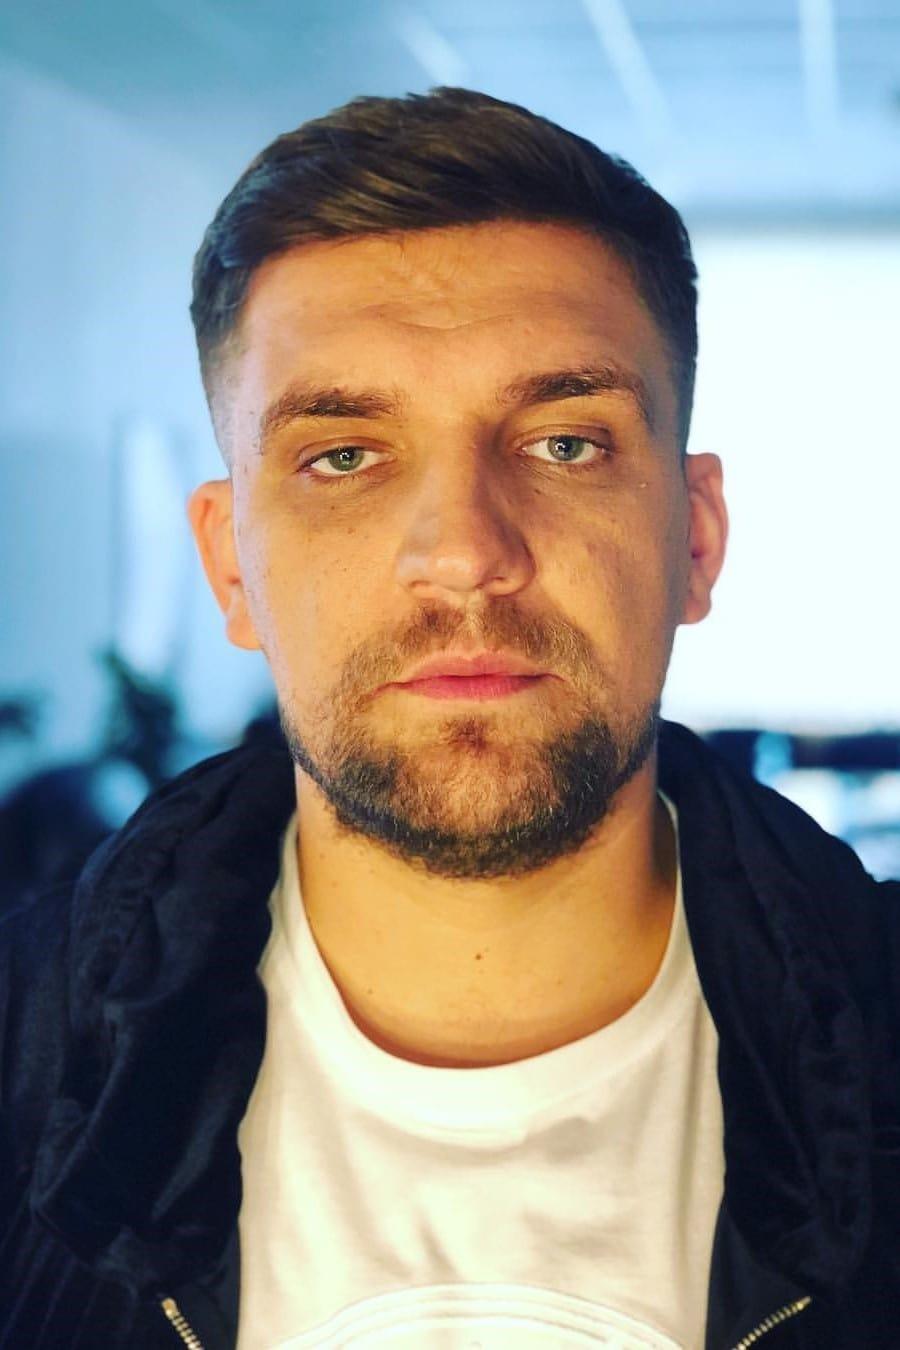 Vasiliy Vakulenko